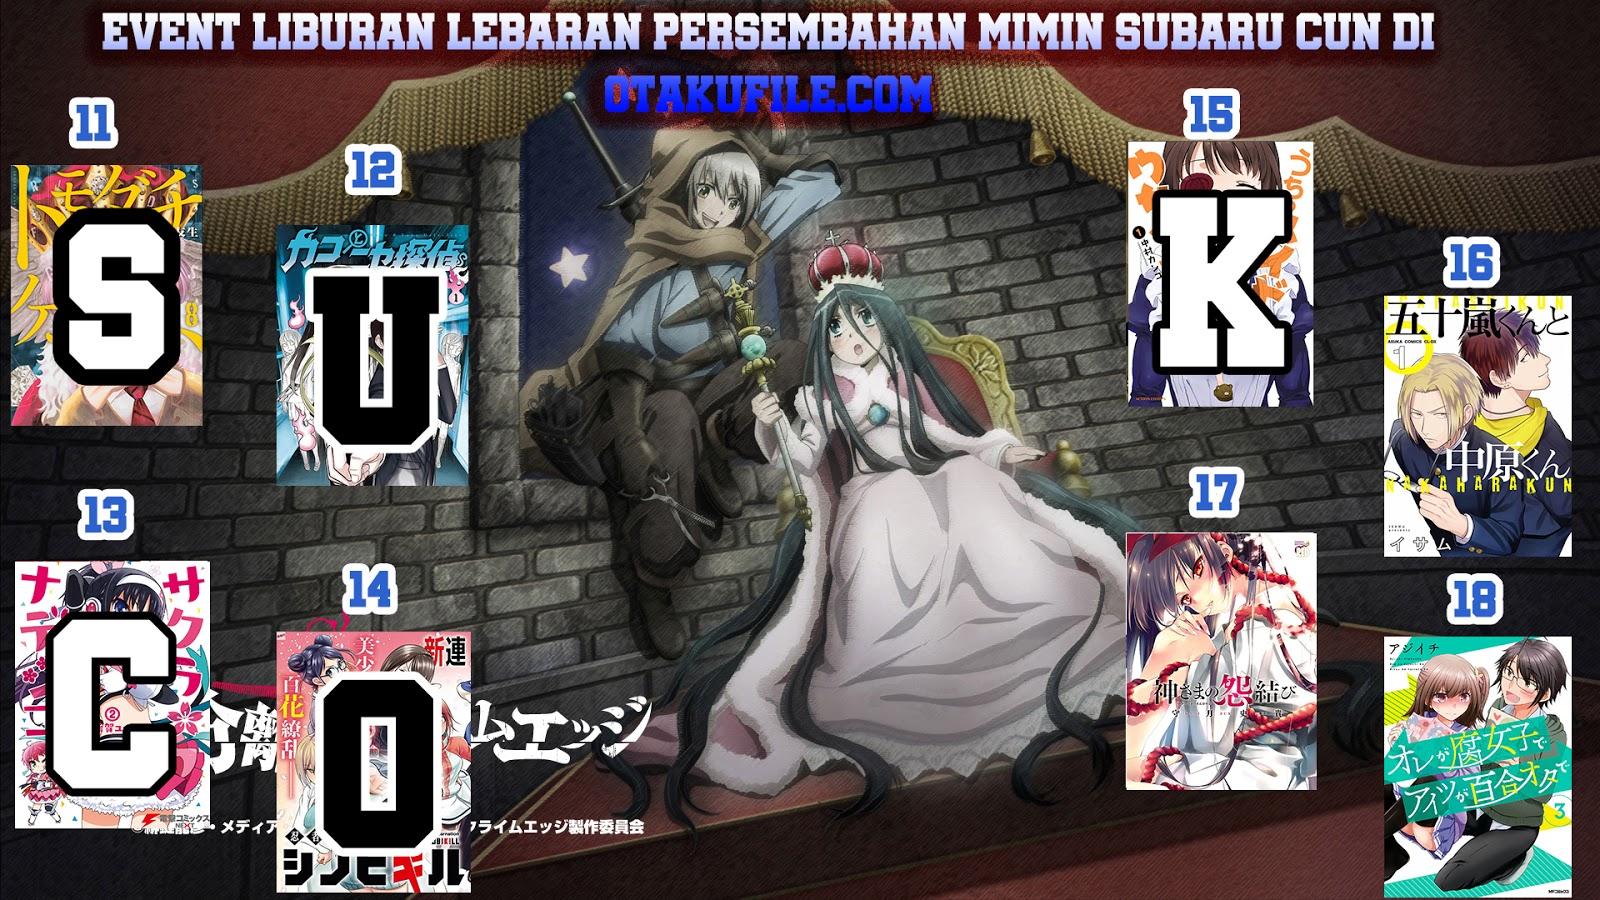 Baca Manga Uchi no Maid ga Uzasugiru! Chapter 1 Komik Station